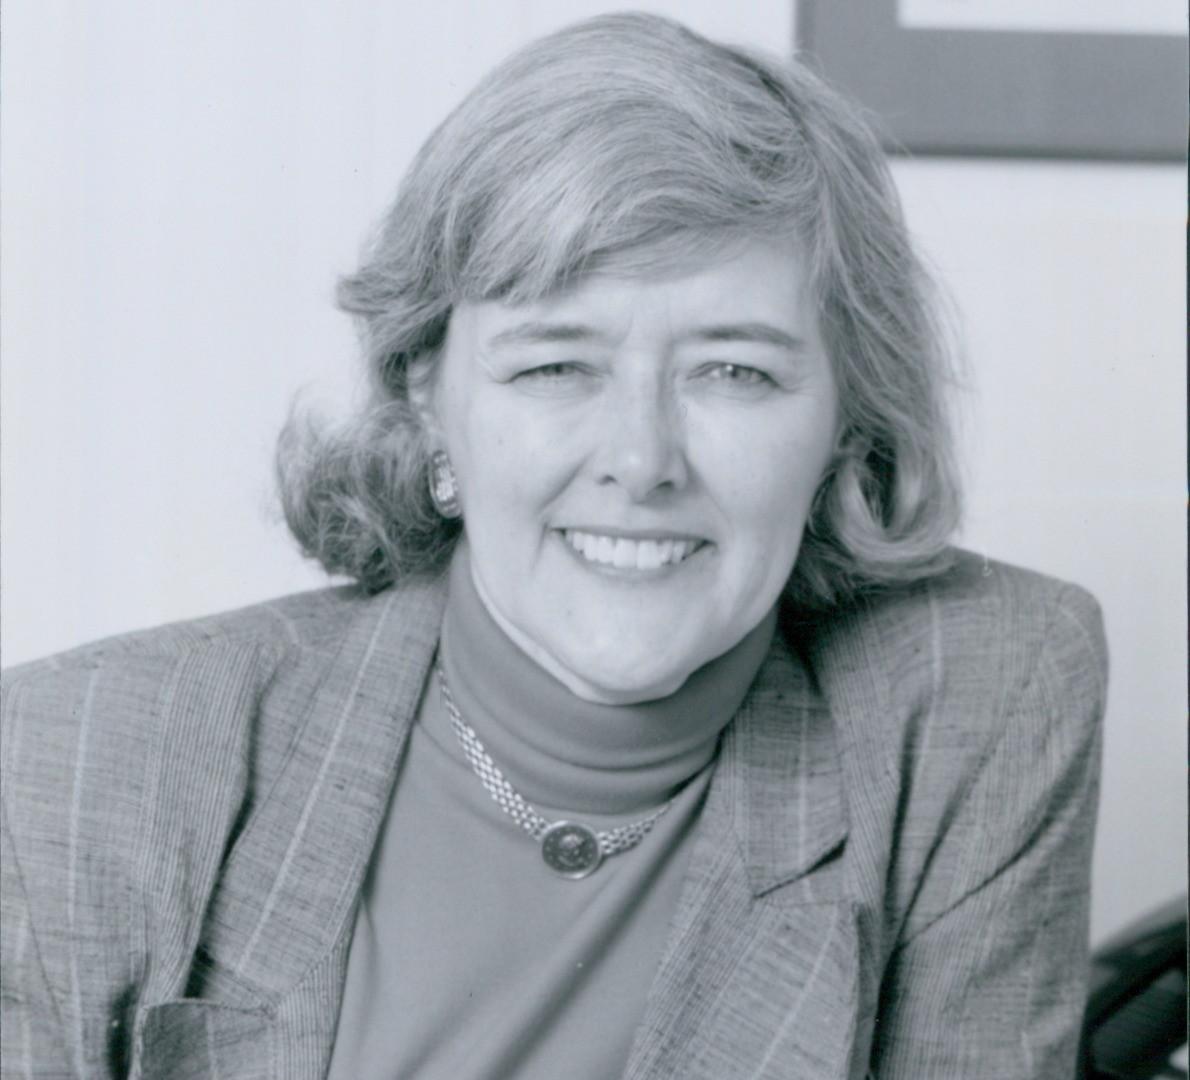 Rep. Patricia Schroeder